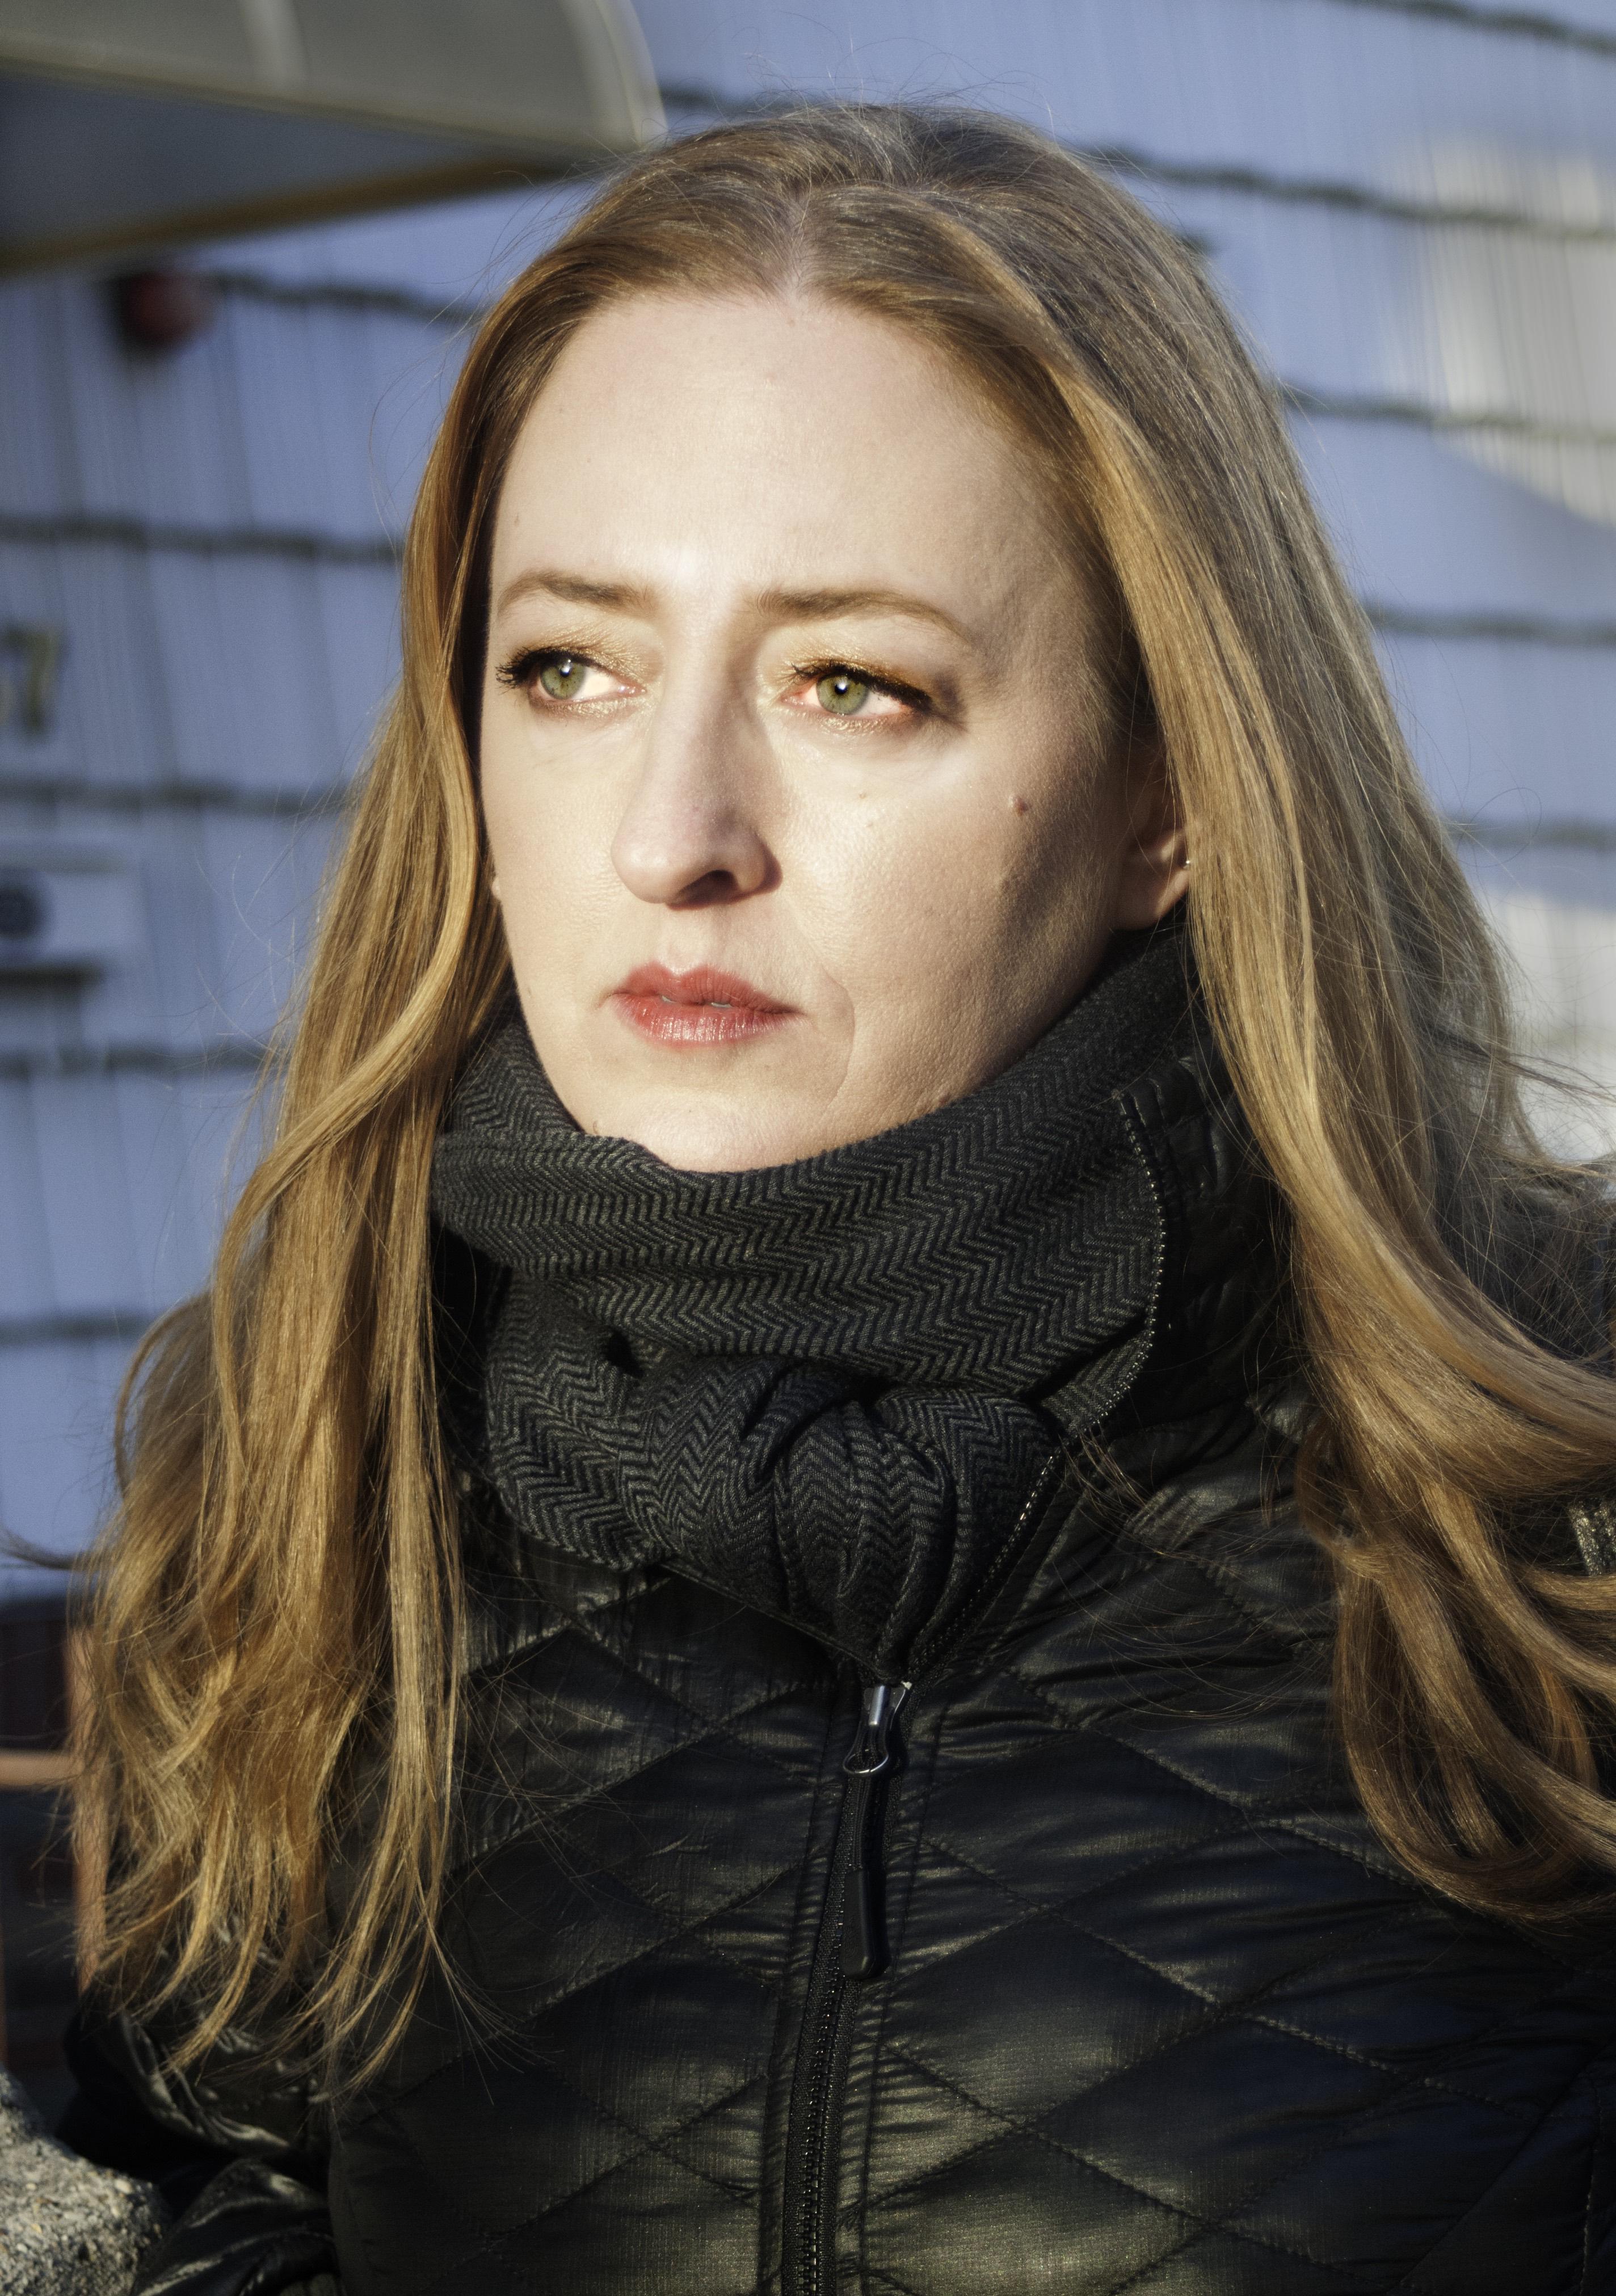 Trish Harnetiaux